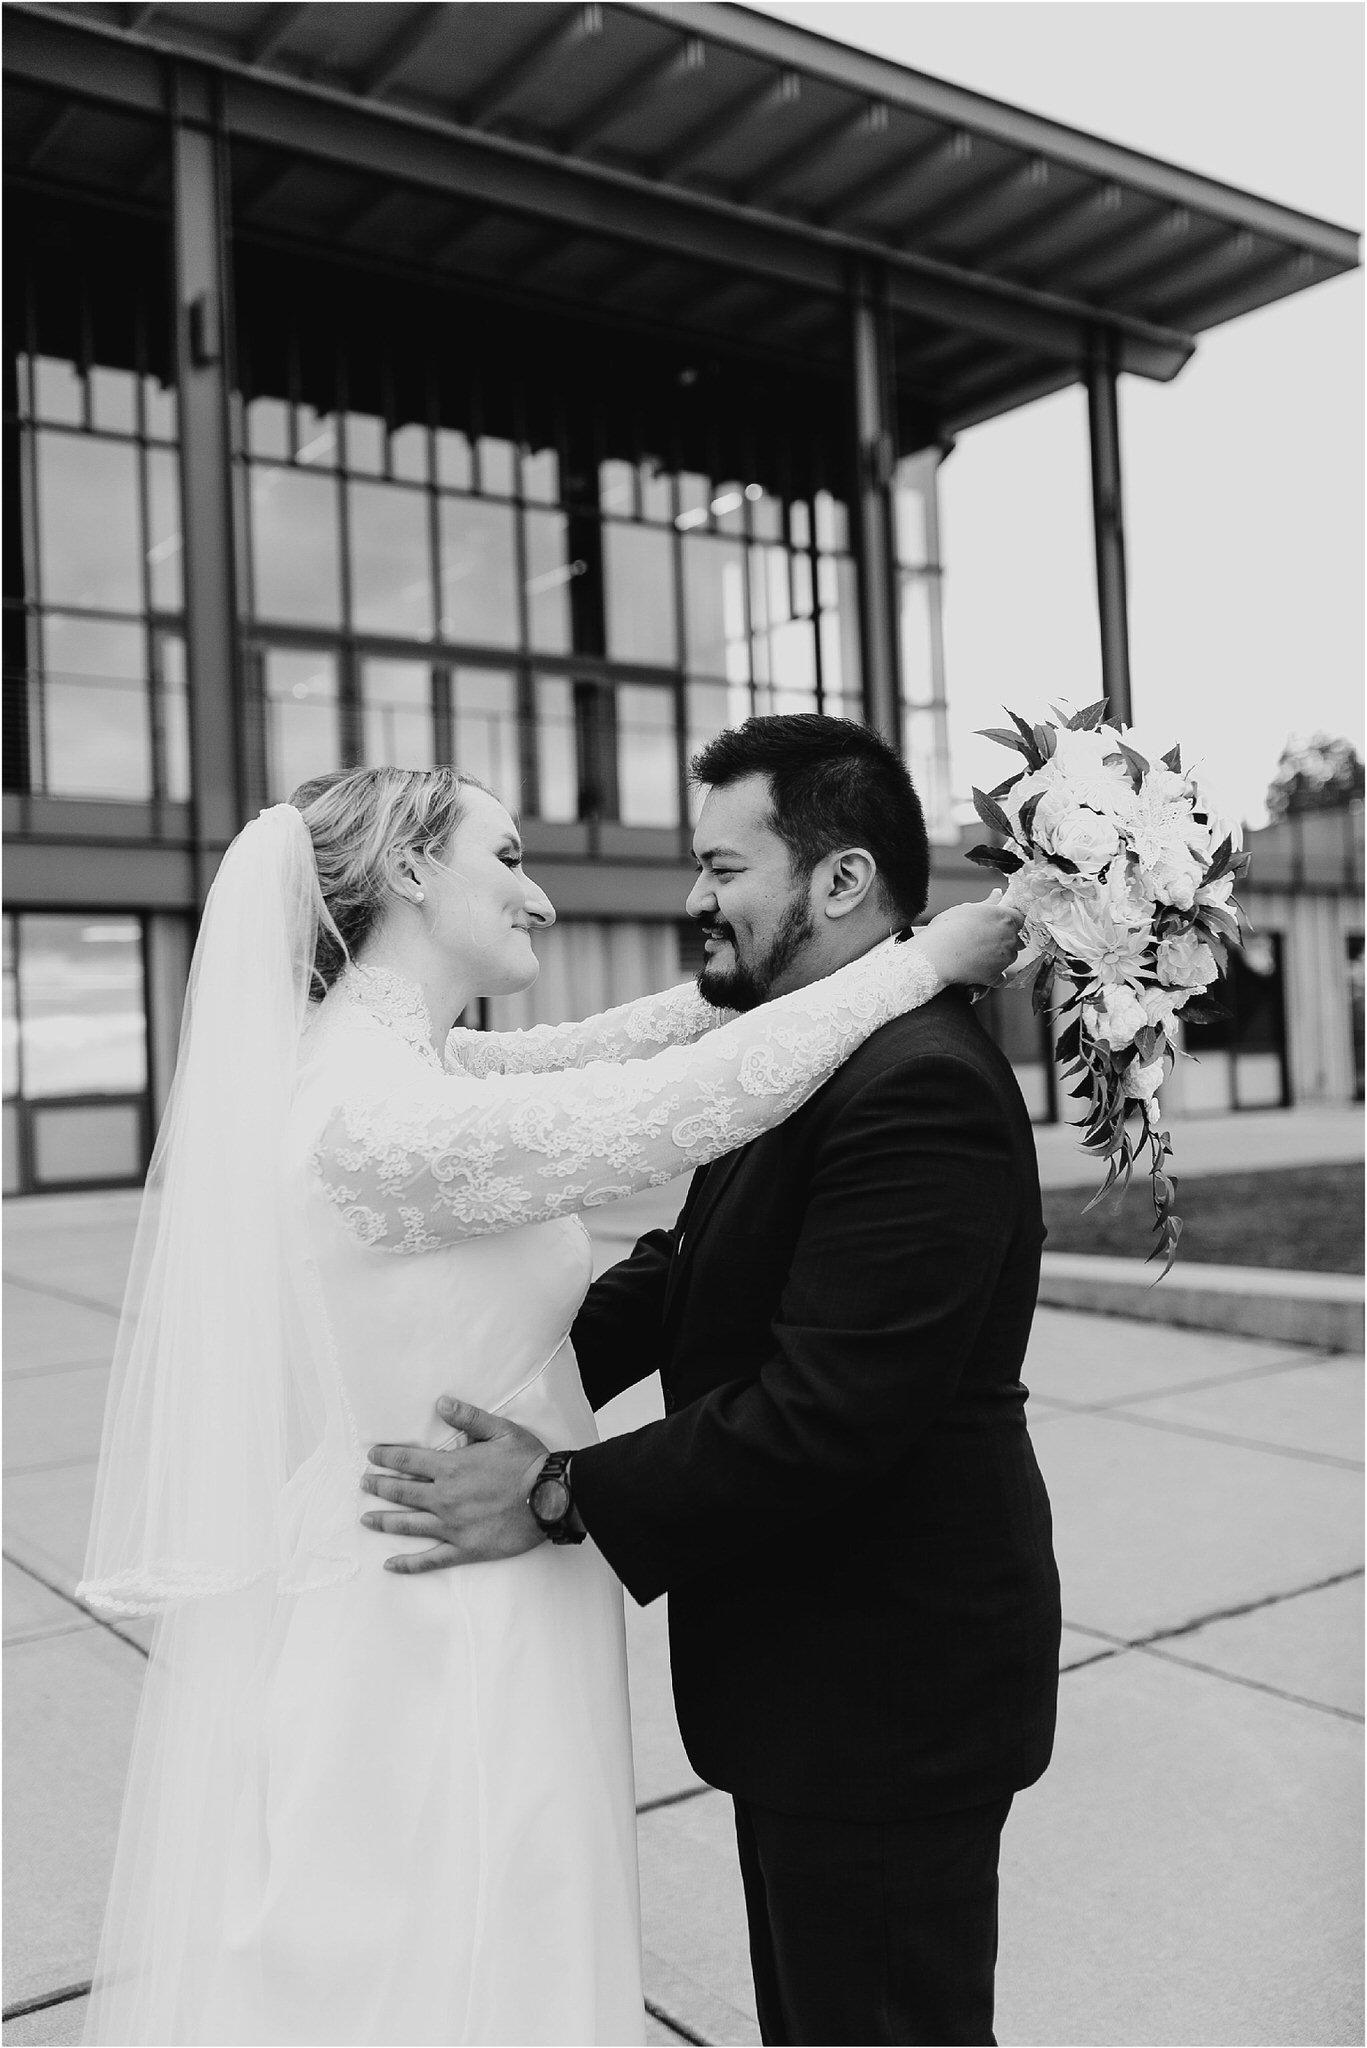 katy-robin-married-in-mukilteo-wedding21.jpg